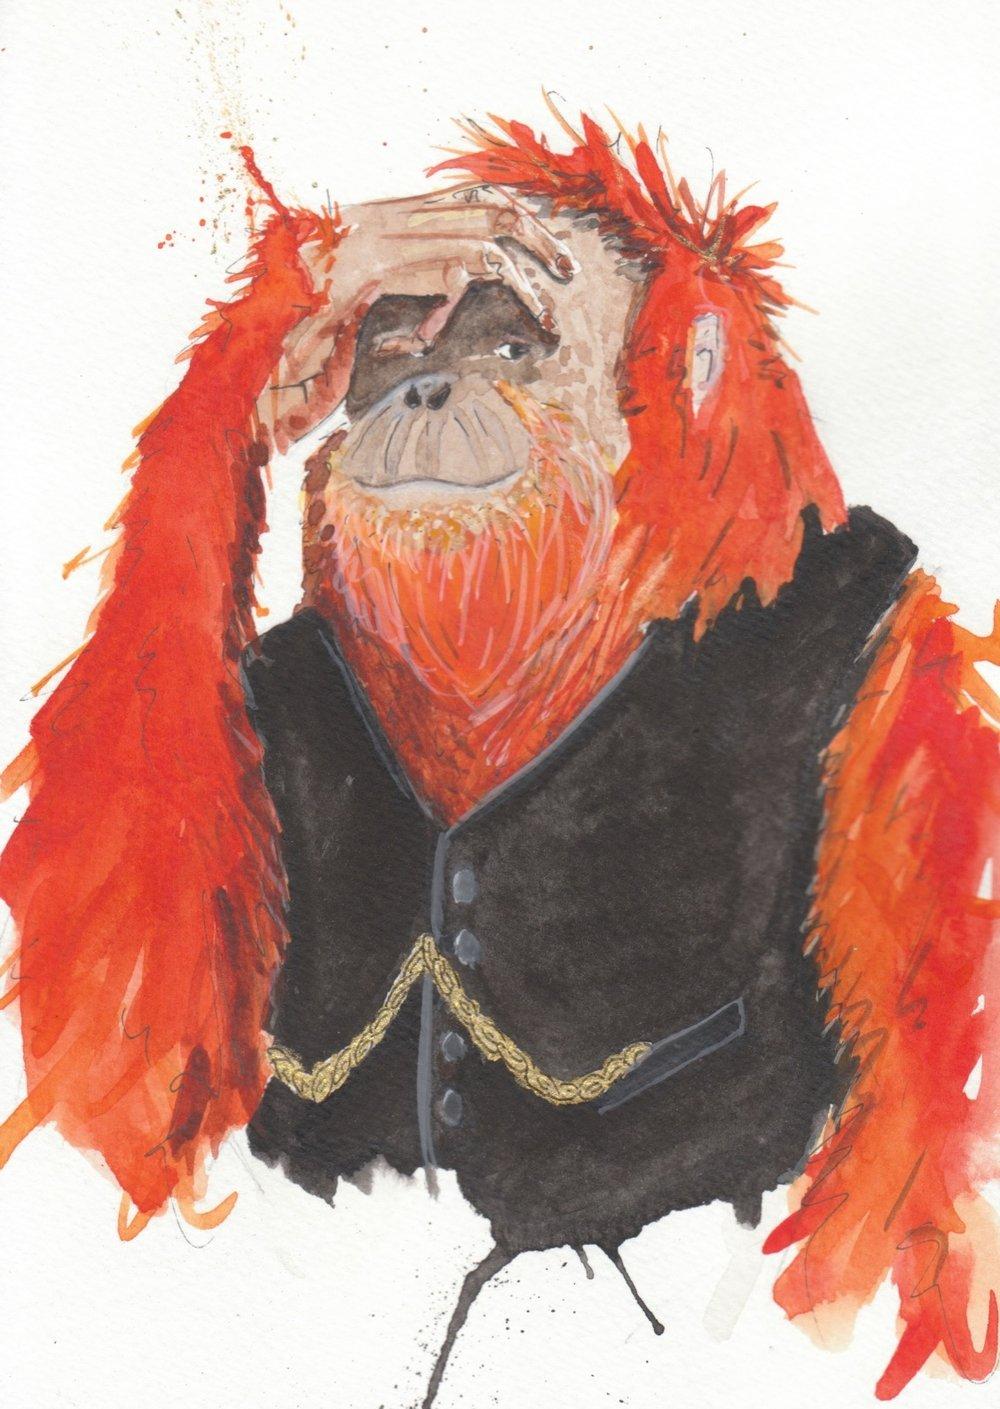 Sir Orangutan